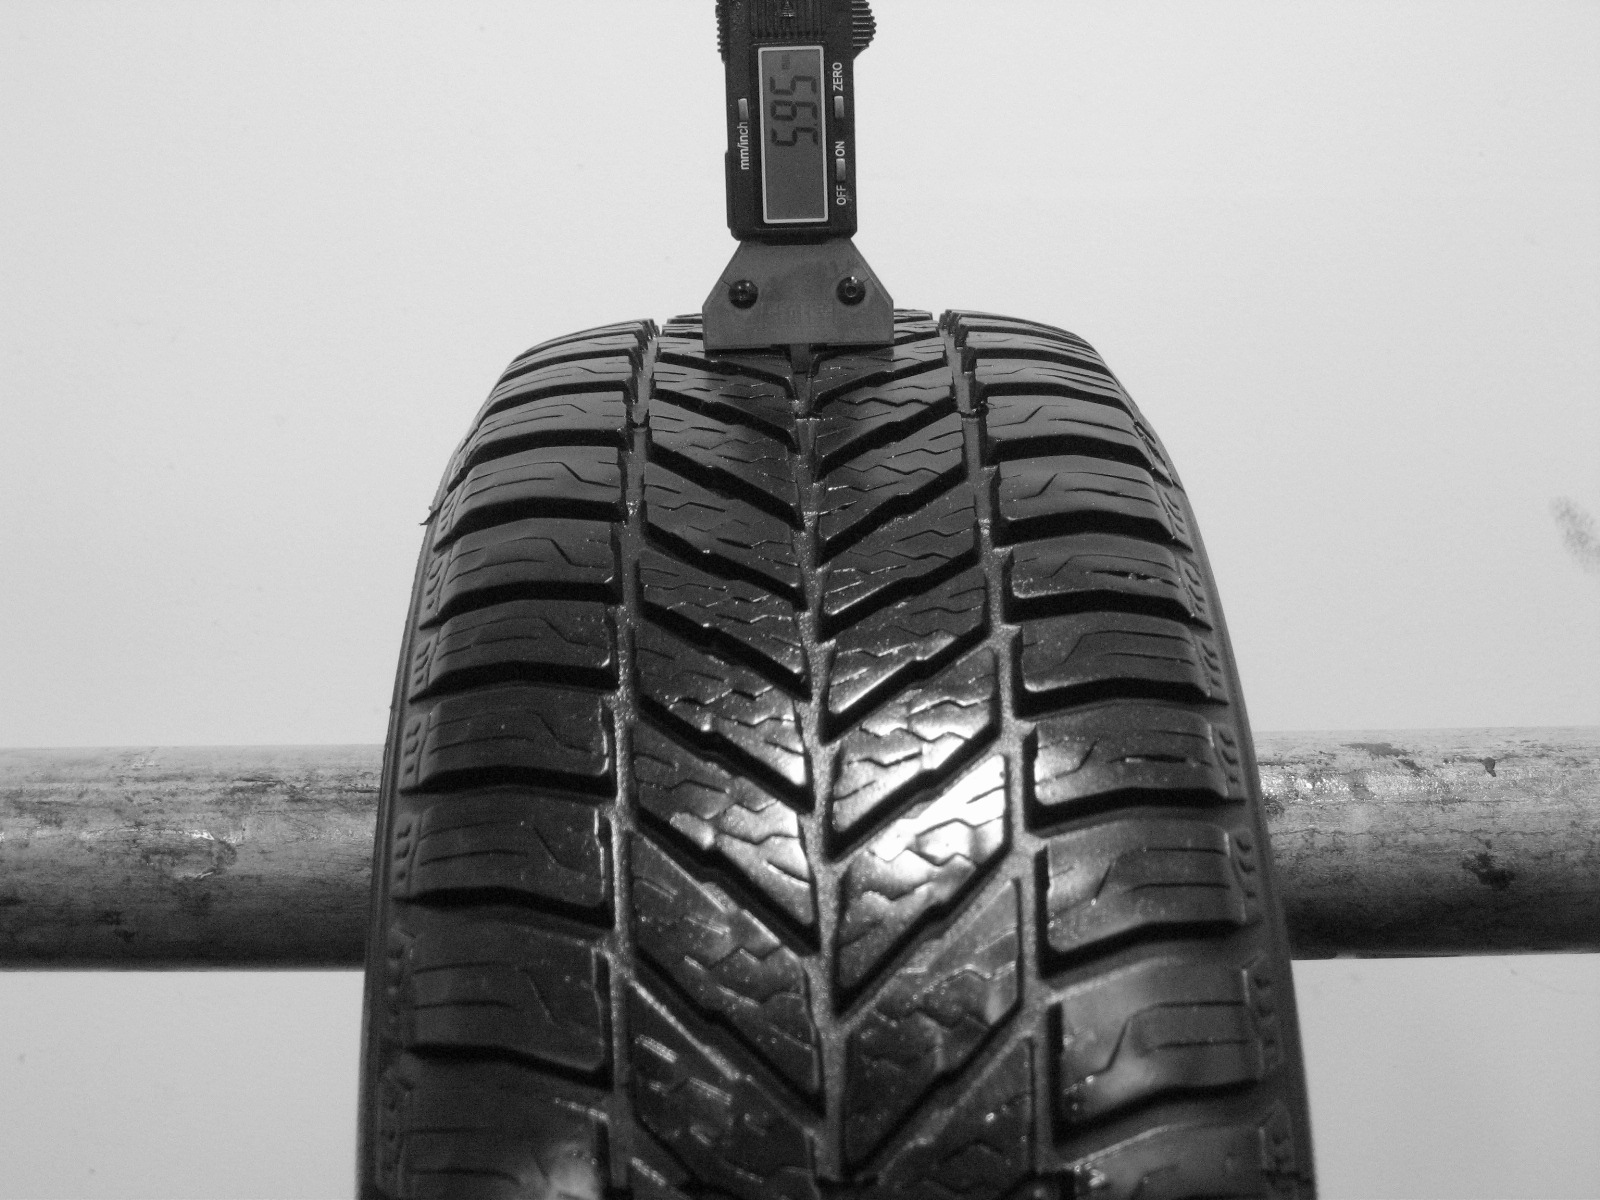 Použité-Pneu-Bazar - 185/60 R14 FULDA KRISTALL GRAVITO-kusovka-rezerva 3mm